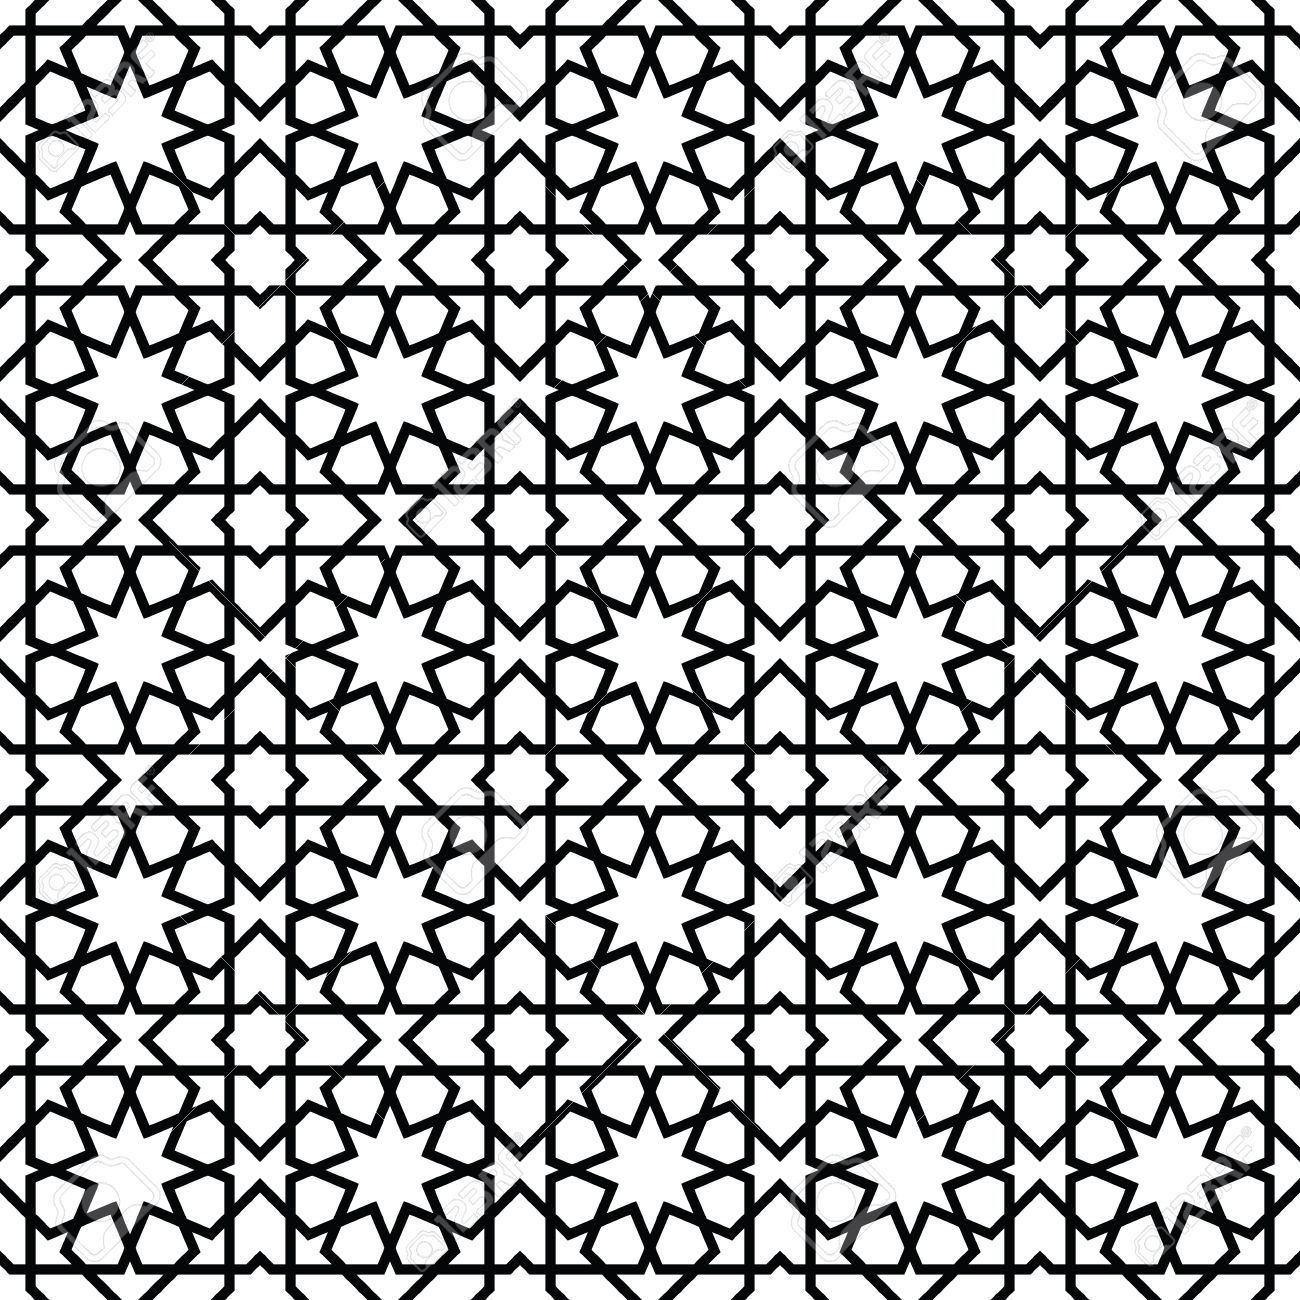 Moroccan Style Mosaic Ornament. Seamless Mosaic Tile Pattern ...